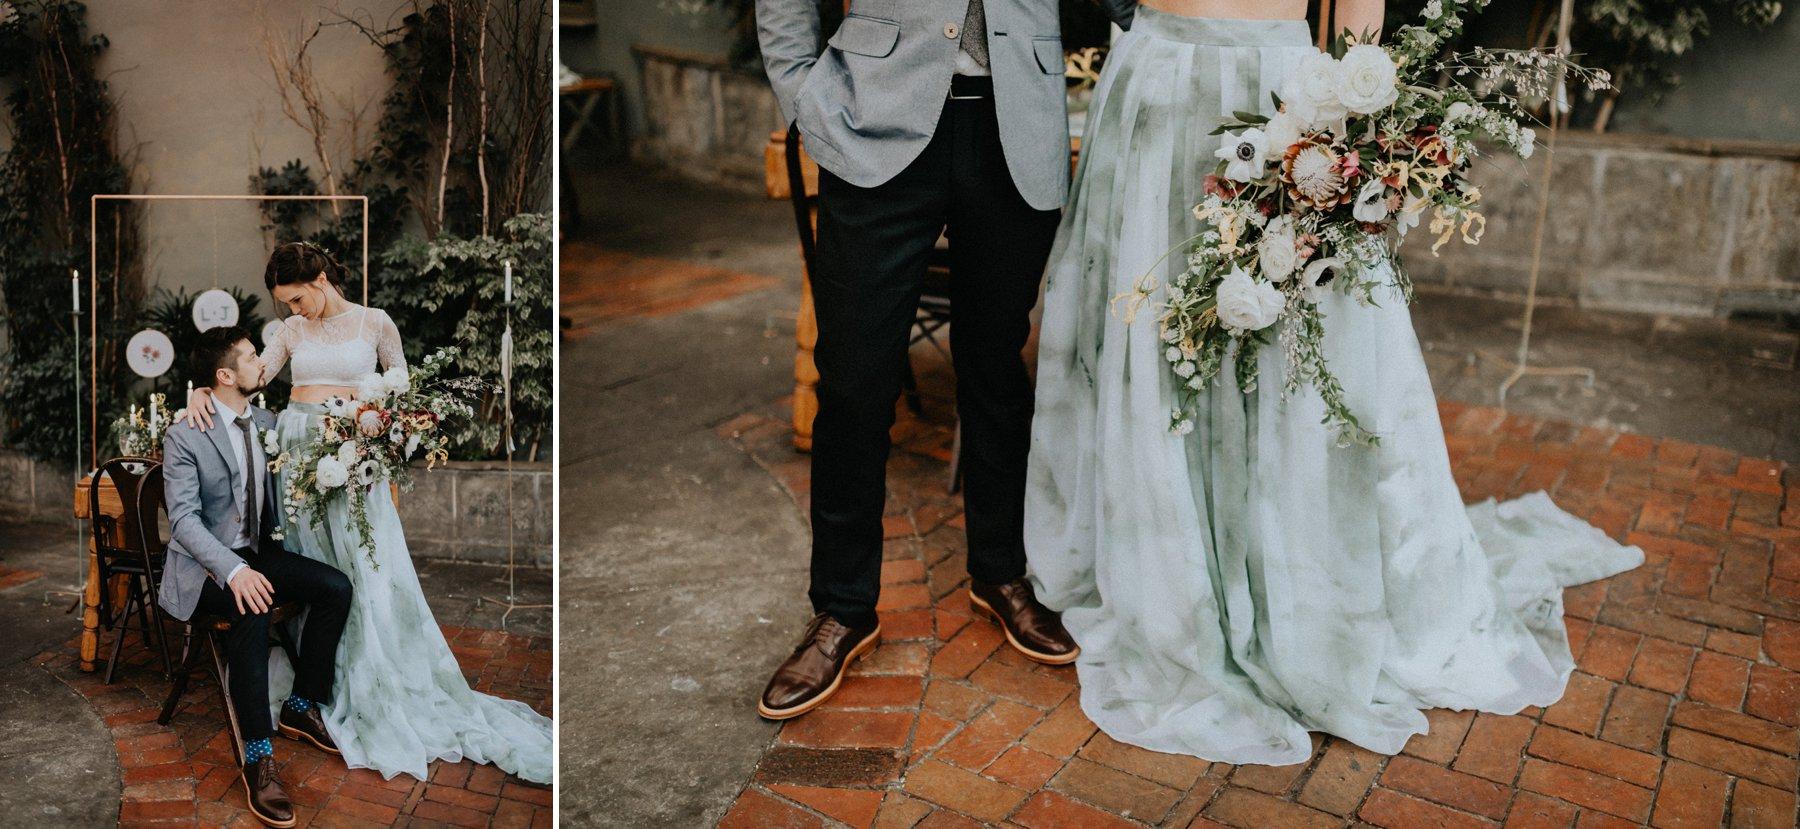 greenhouse-botanical-wedding-34.jpg